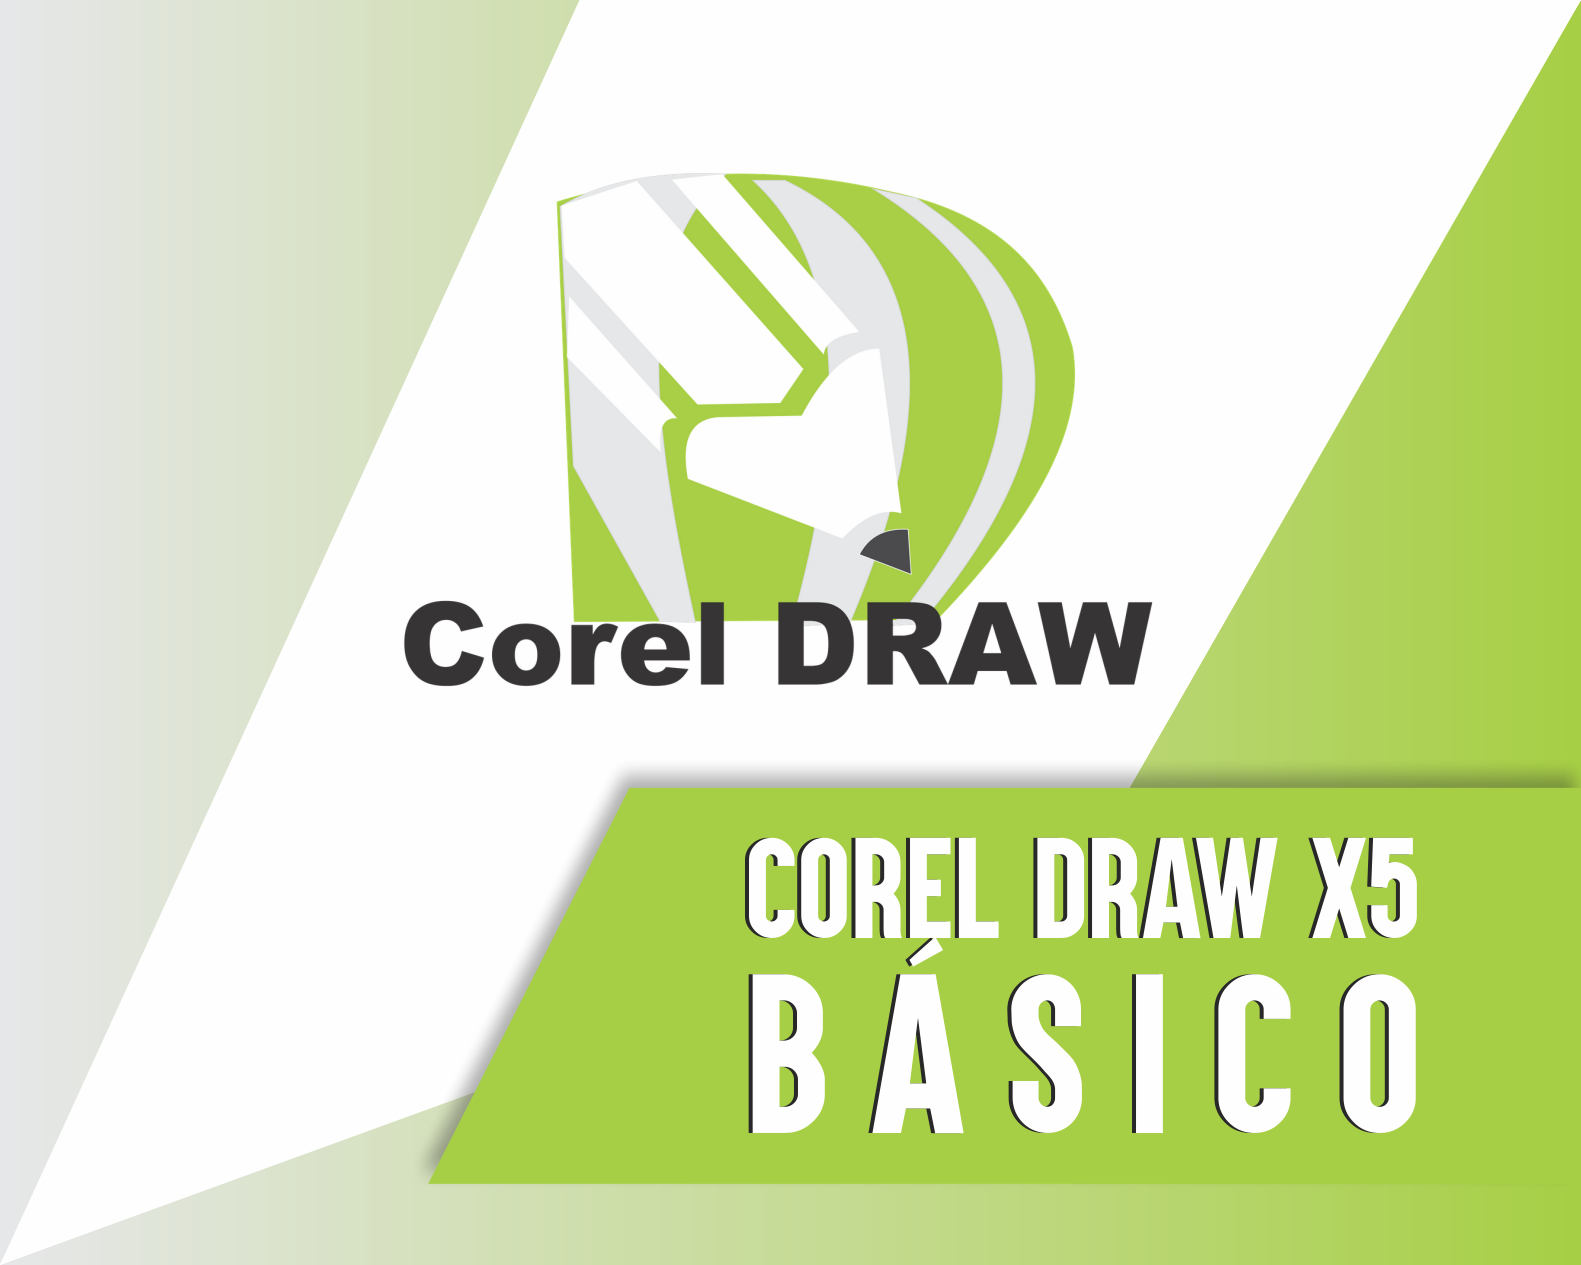 Corel Draw X5 - Básico